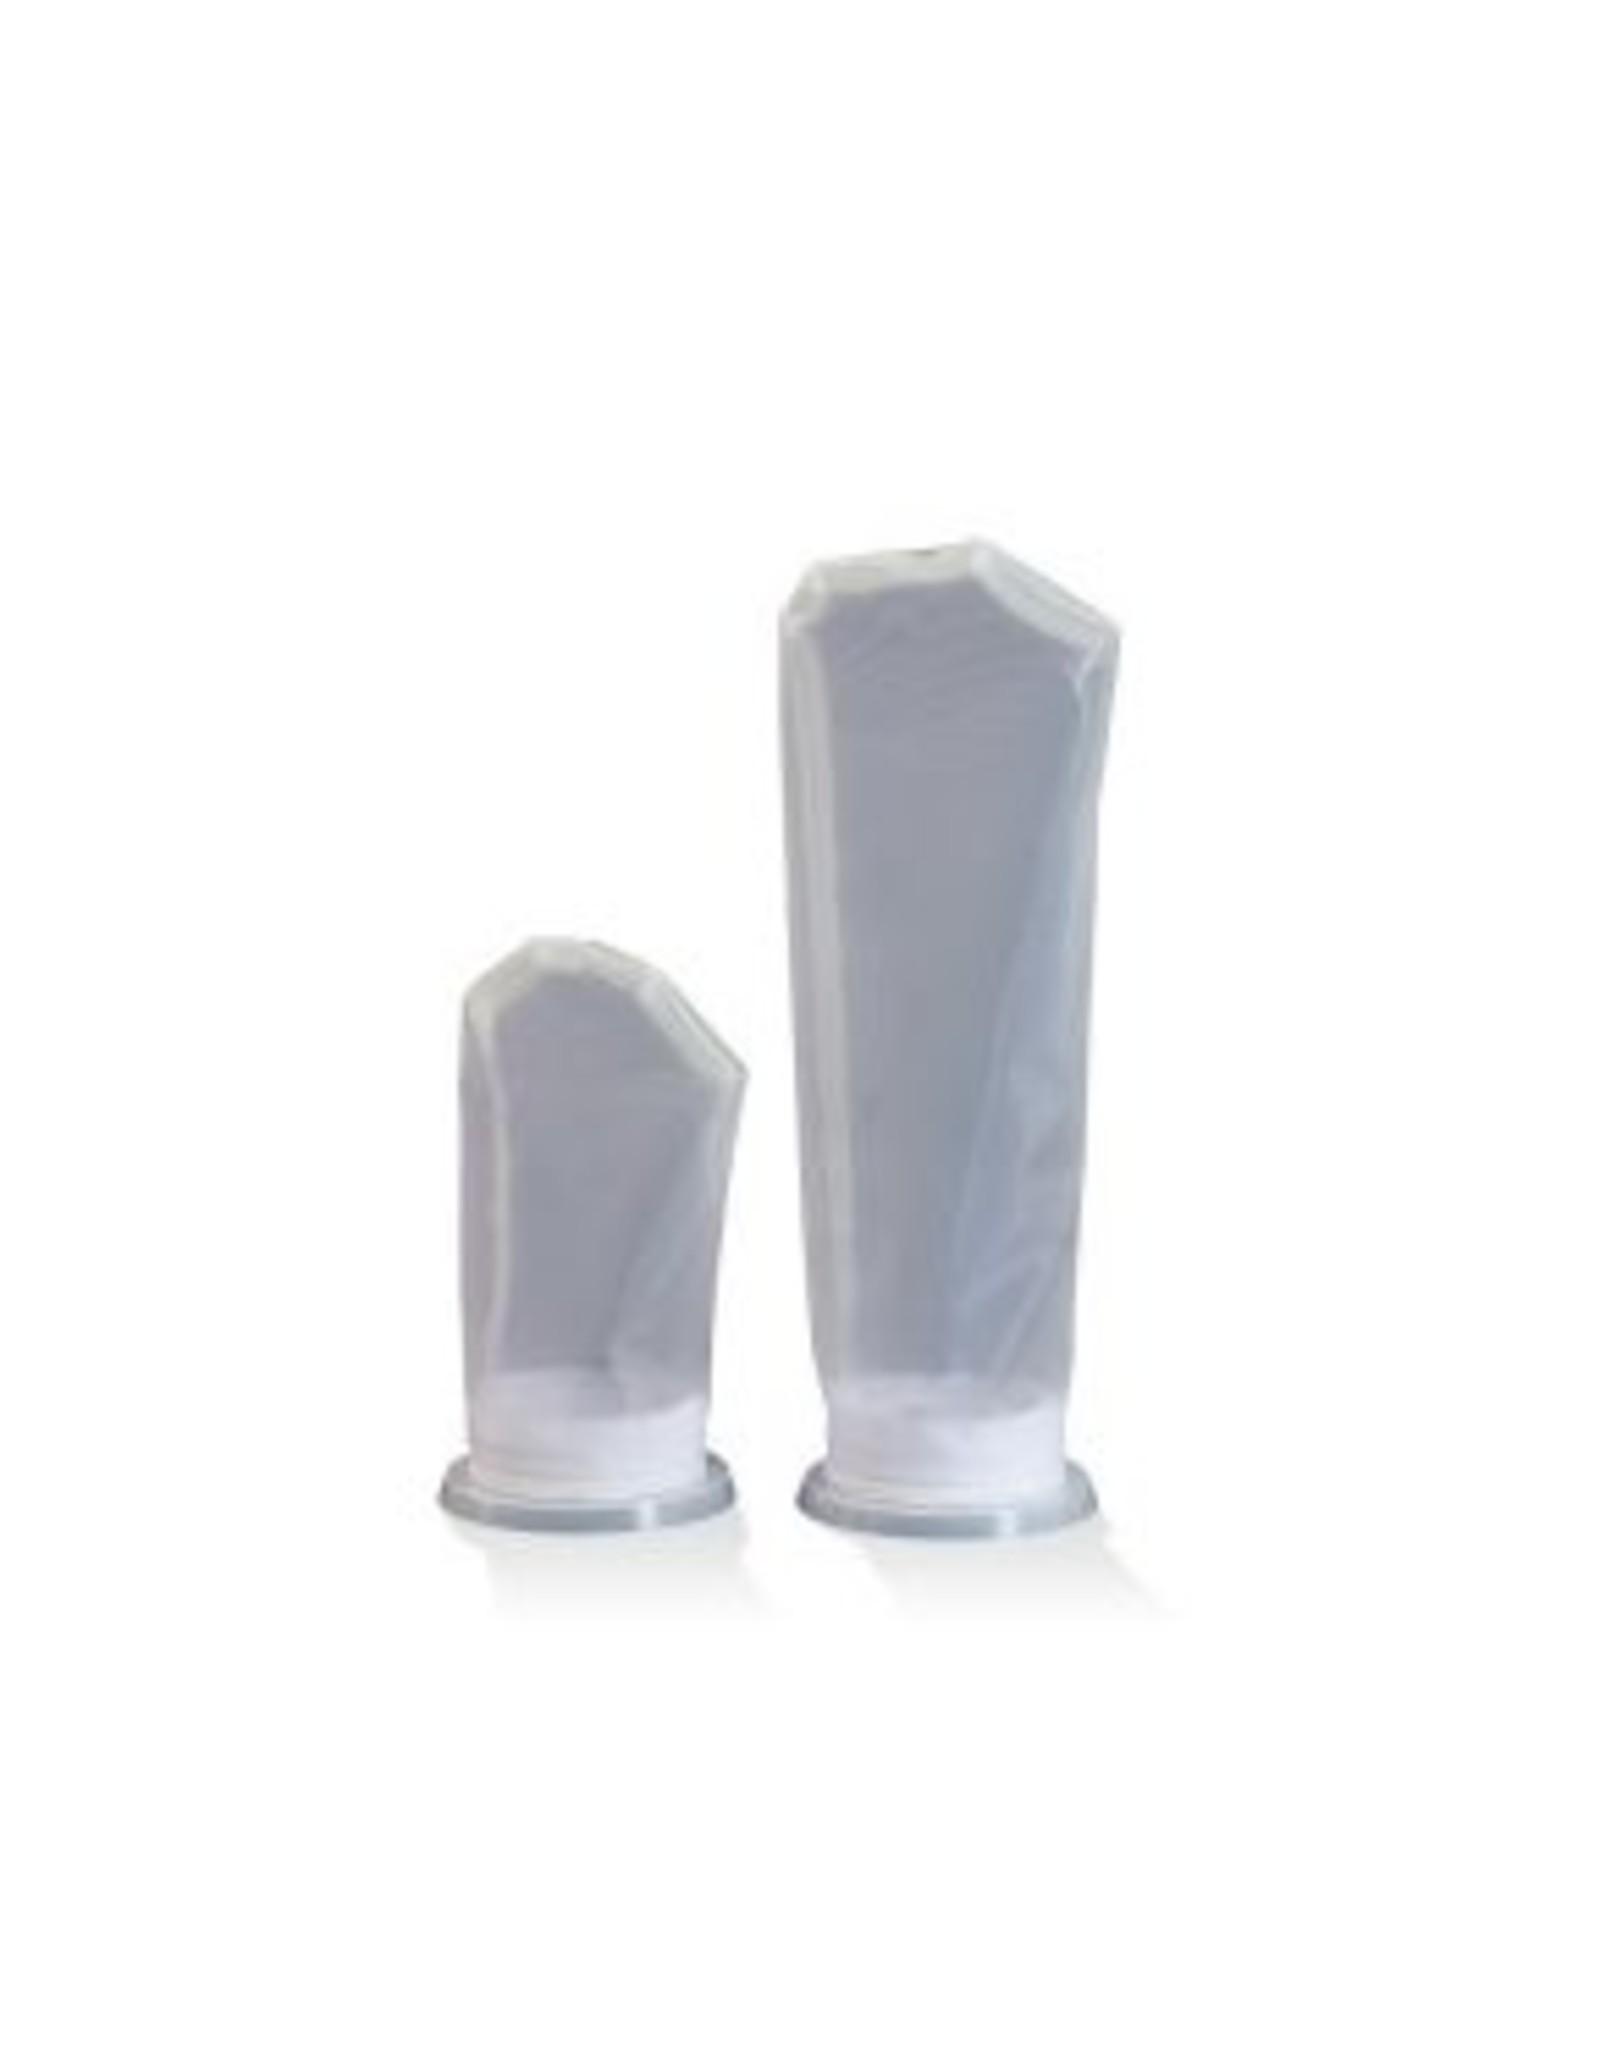 Graco Supply Line / Return Line Bag Filters